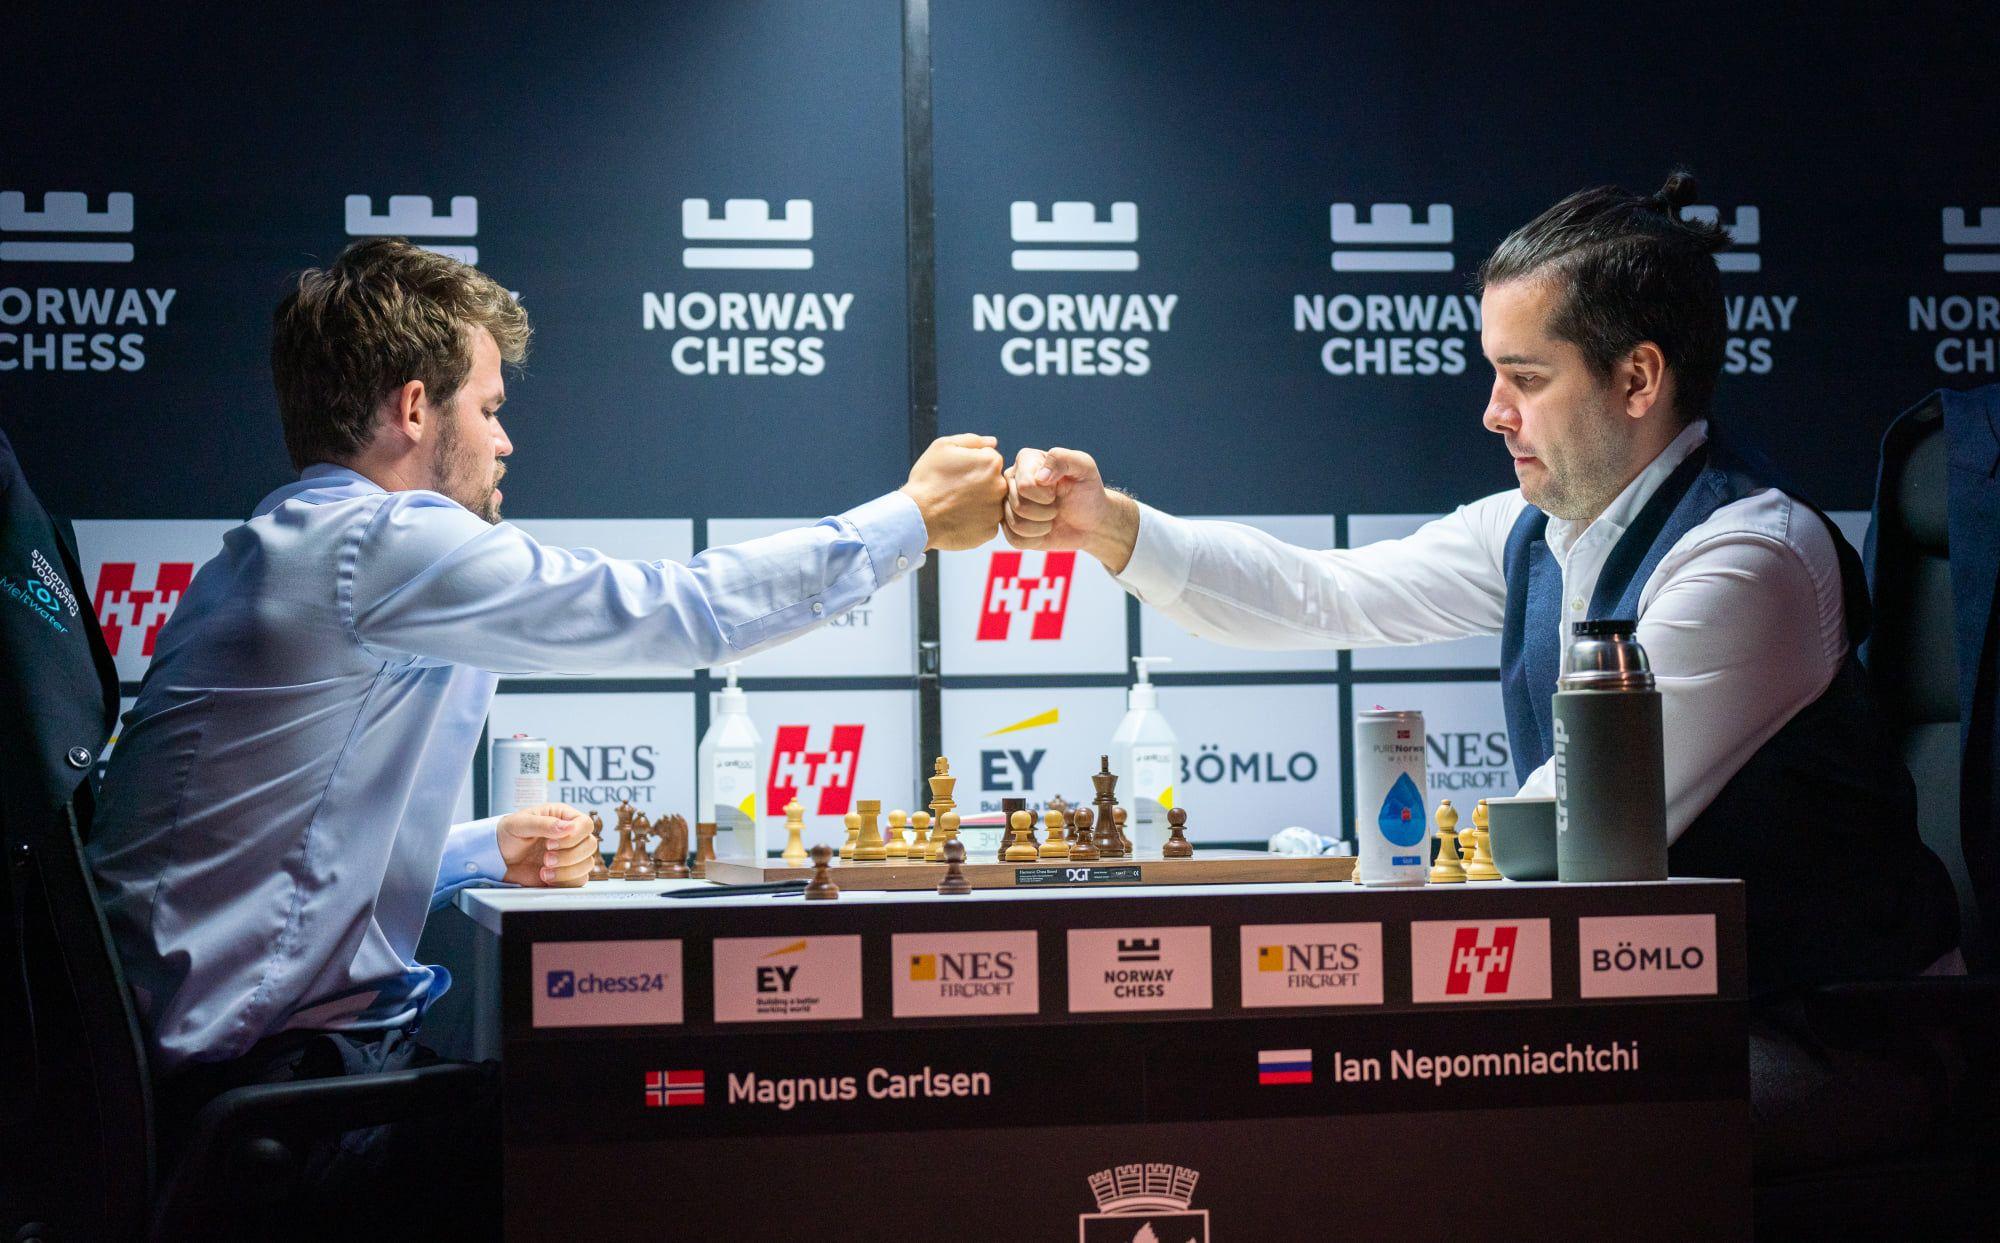 Carlsen Nepomniachtchi Noruega Xadrez 2021